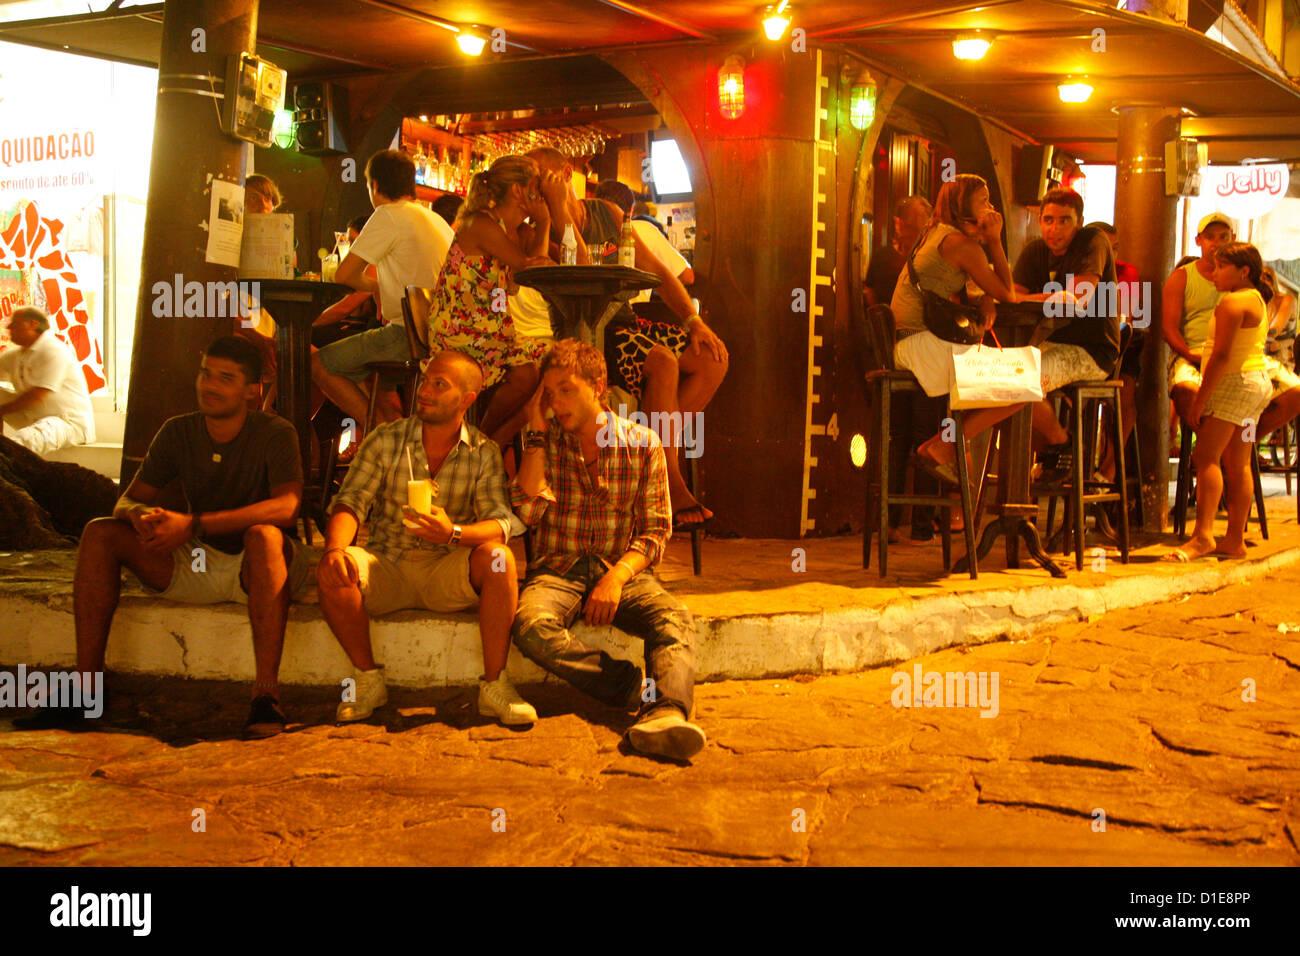 People at a bar on Rua Das Pedras, Buzios, Rio de Janeiro State, Brazil, South America - Stock Image